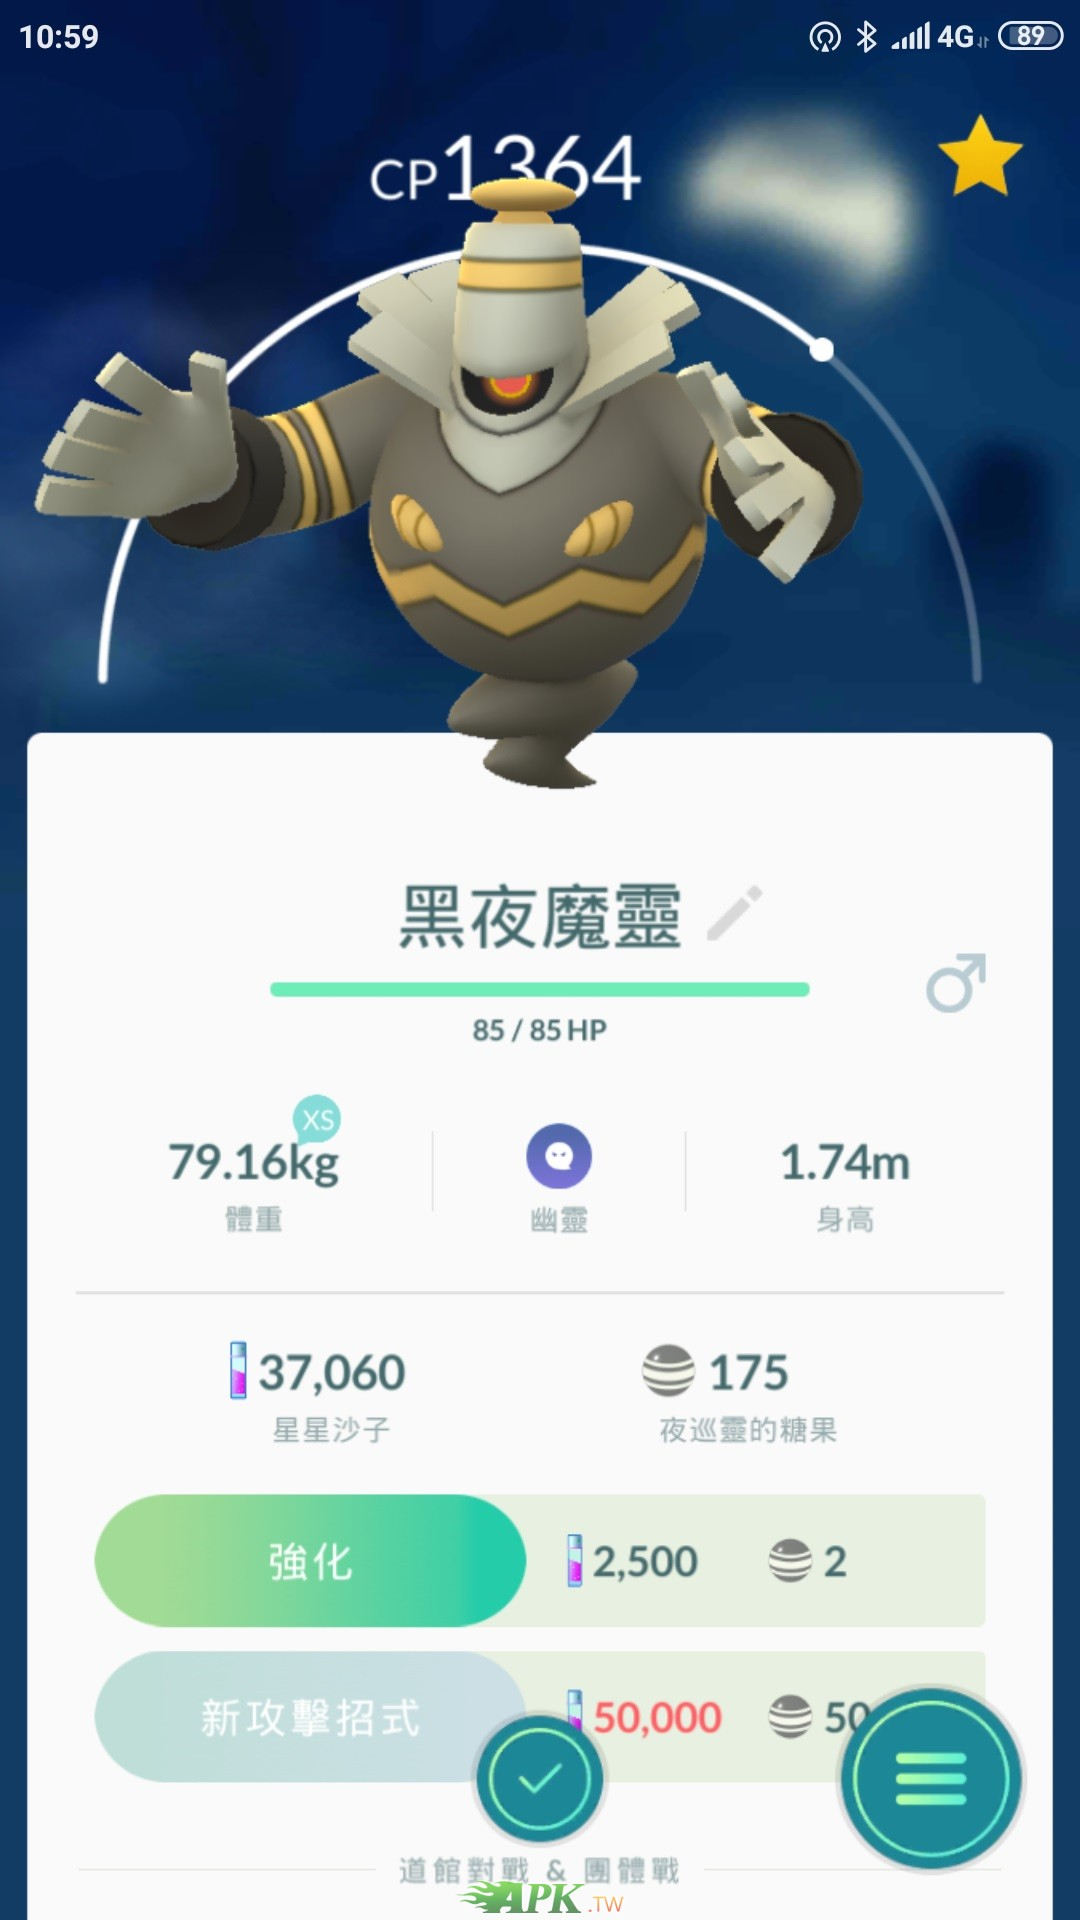 Screenshot_2019-02-18-10-59-58-305_com.nianticlabs.pokemongo.jpg